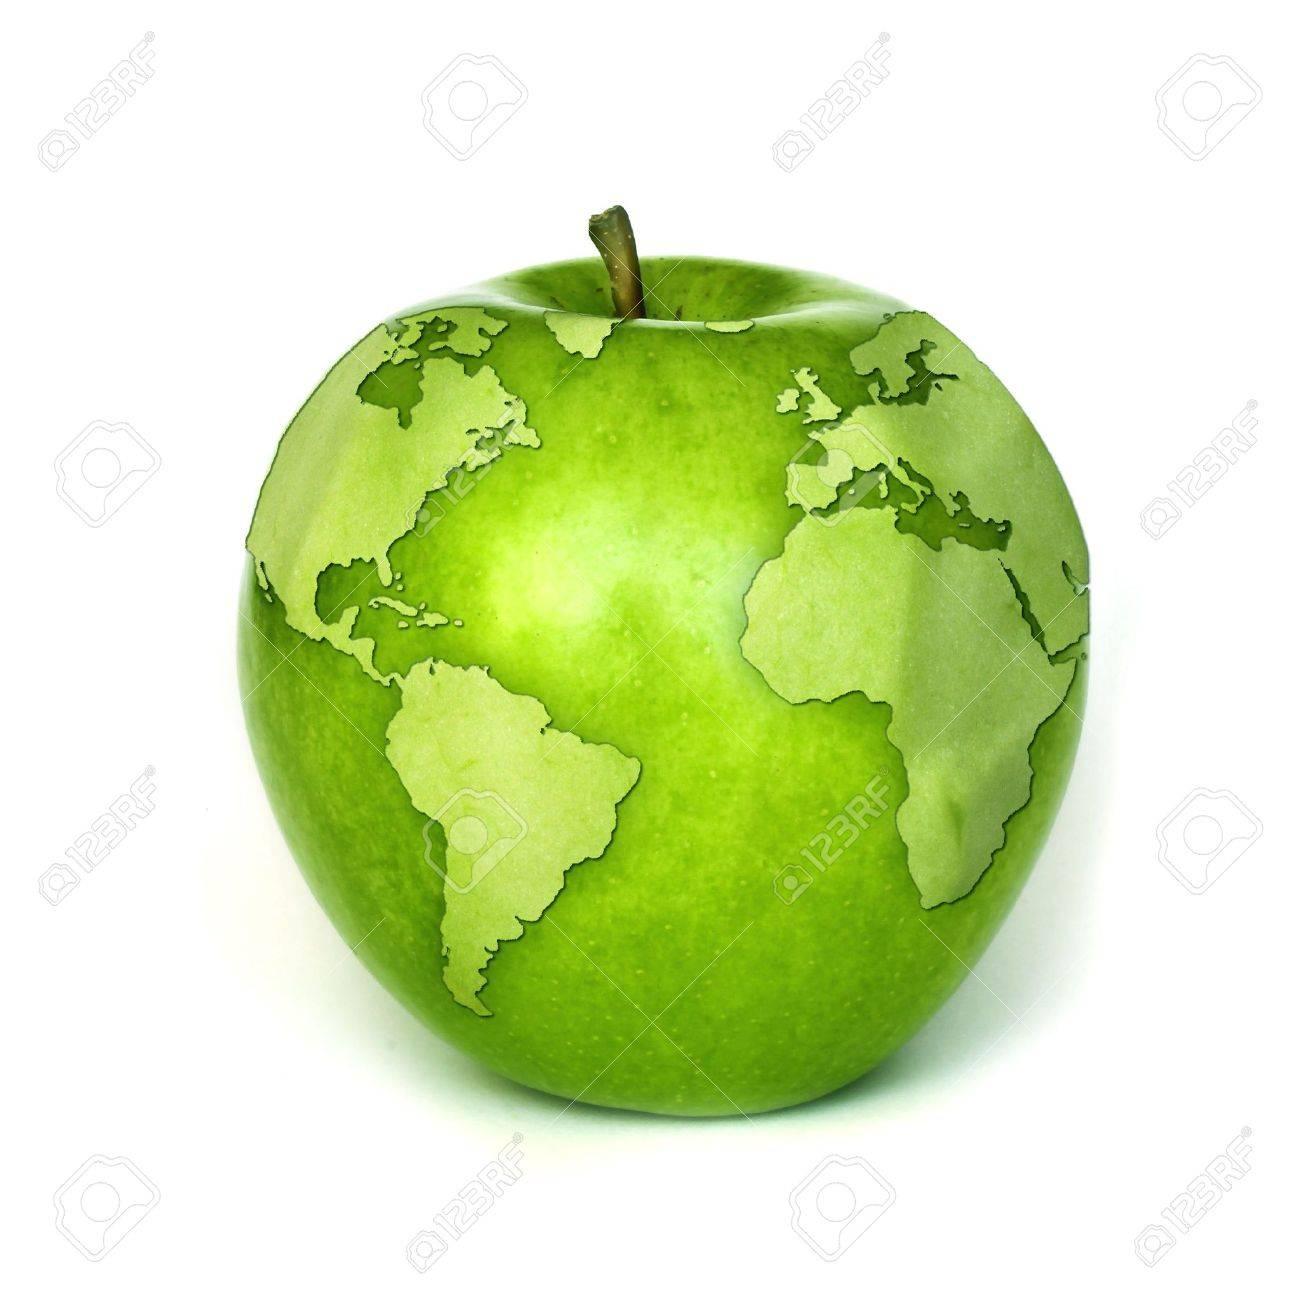 apple contours of the globe Stock Photo - 3061013